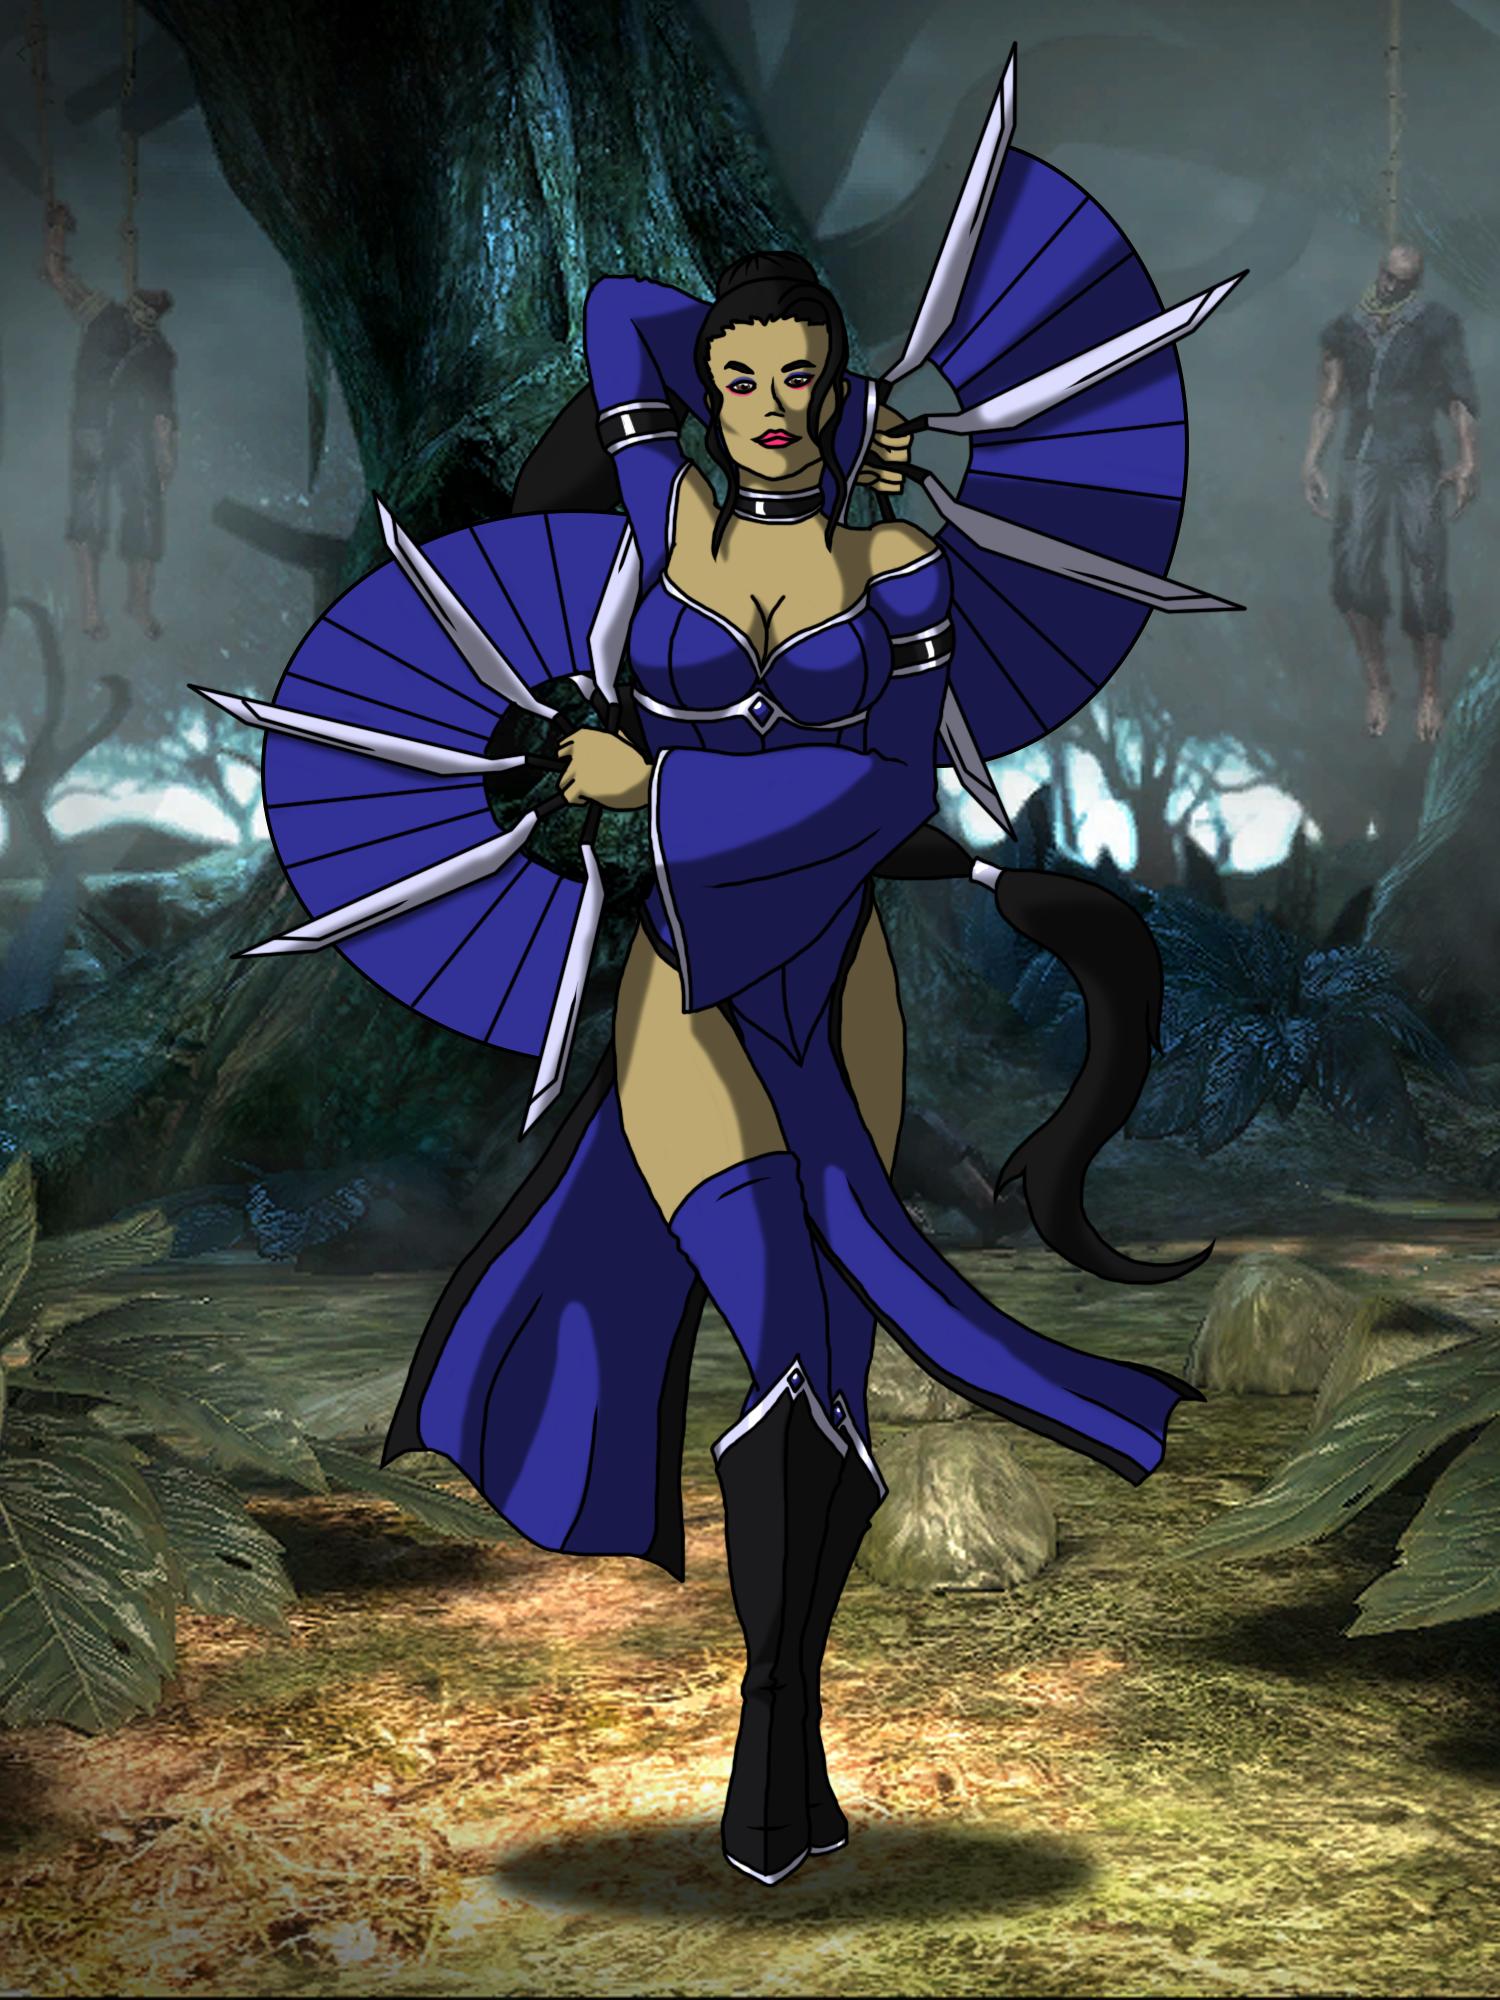 Kitana - Revised Outfit - Mortal Kombat Online